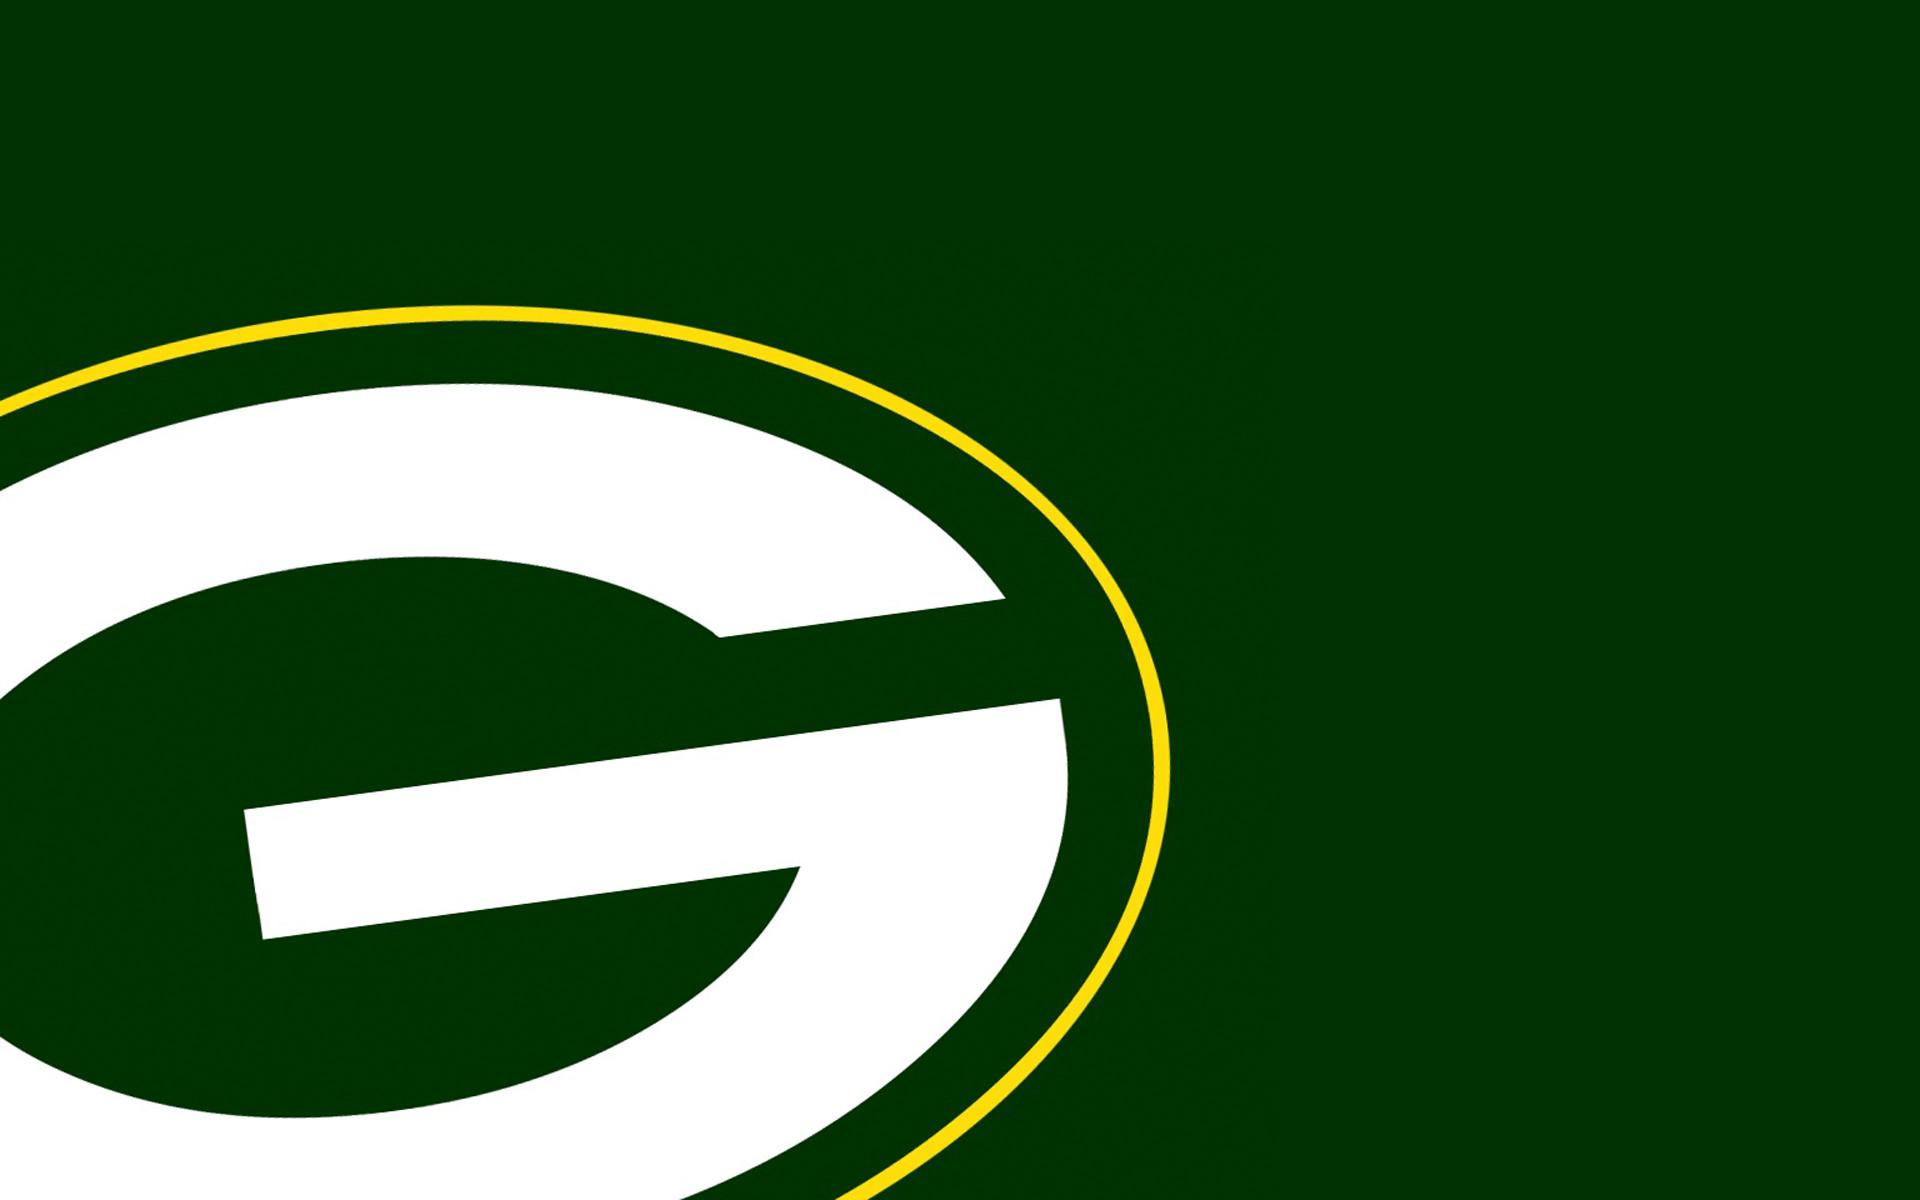 Free Green Bay Packers desktop image | Green Bay Packers wallpapers